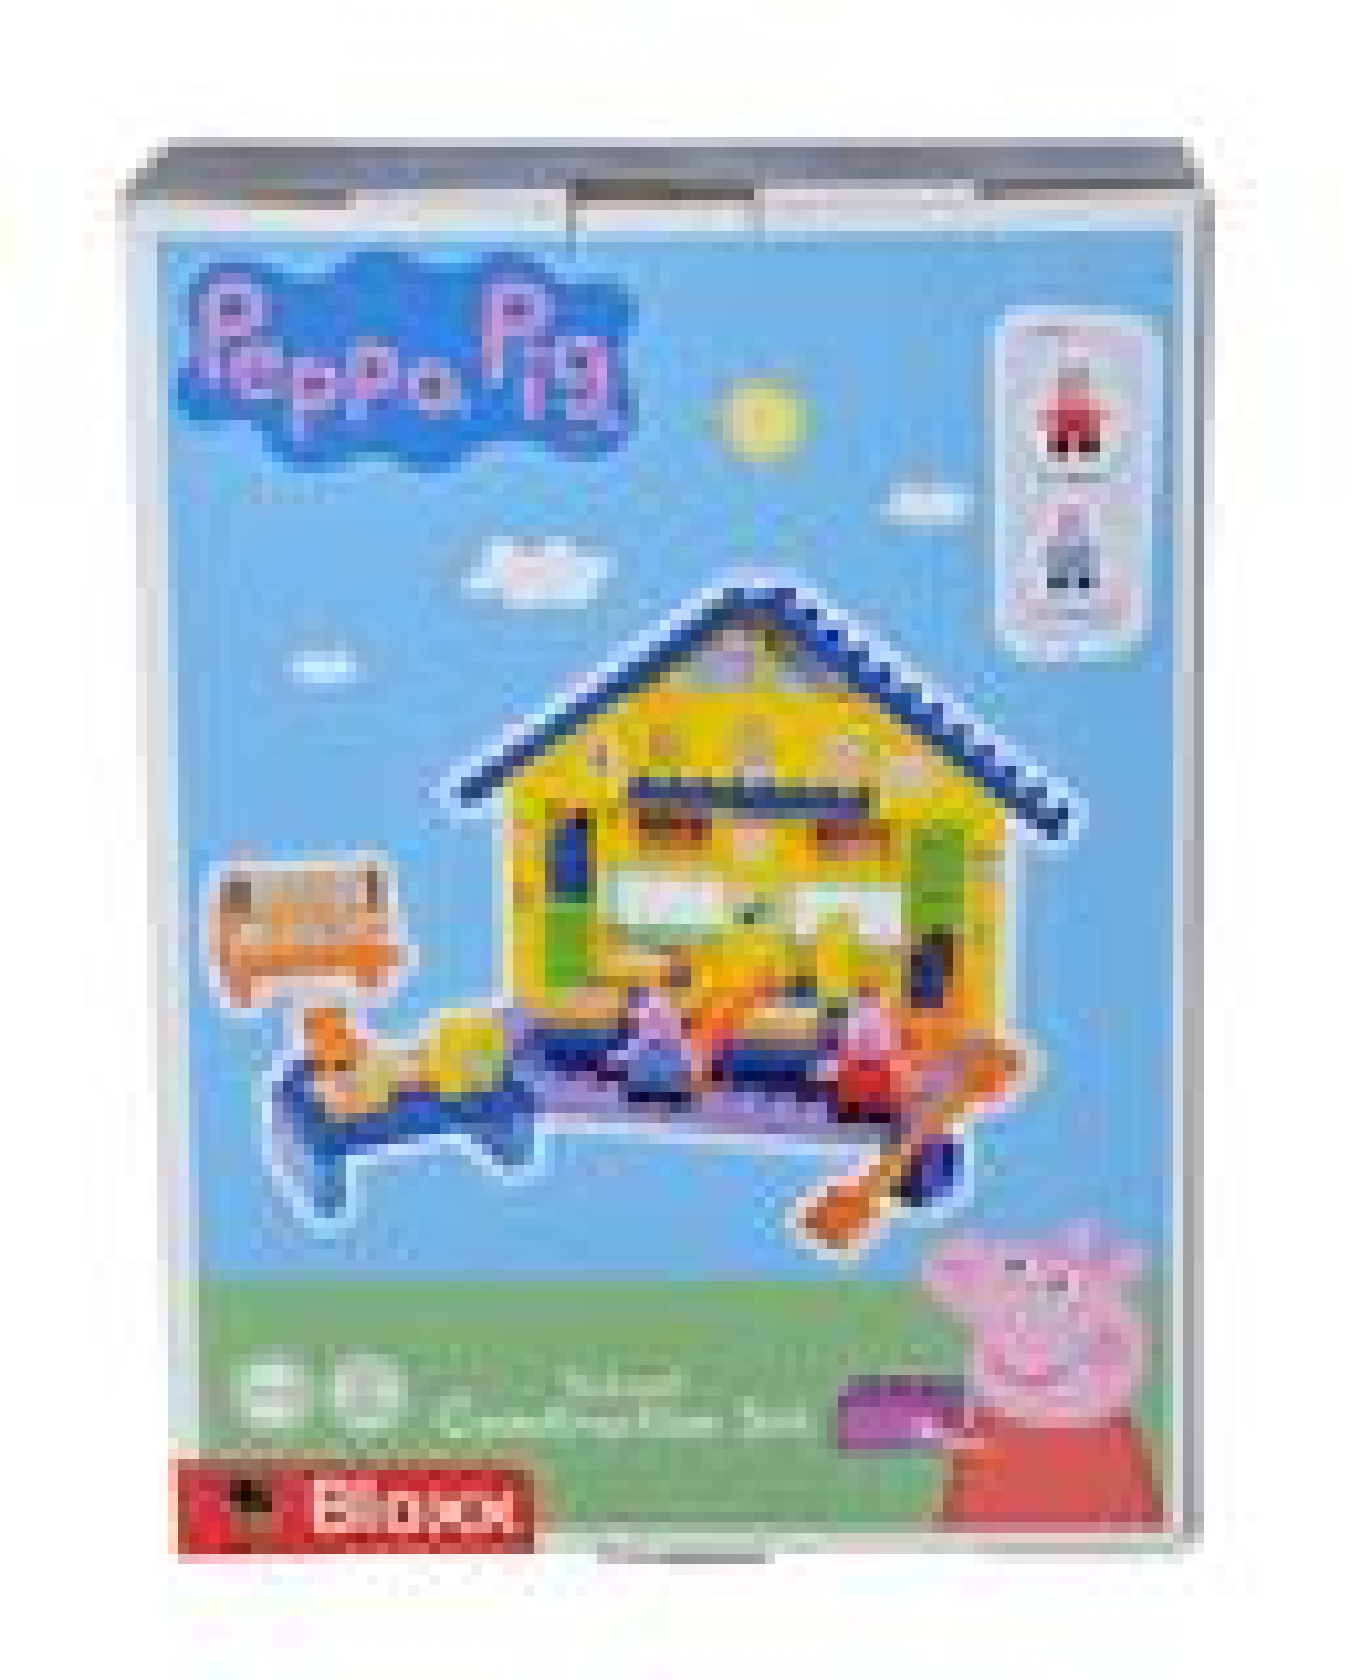 Peppa Pig Bloxx - Peppa's School